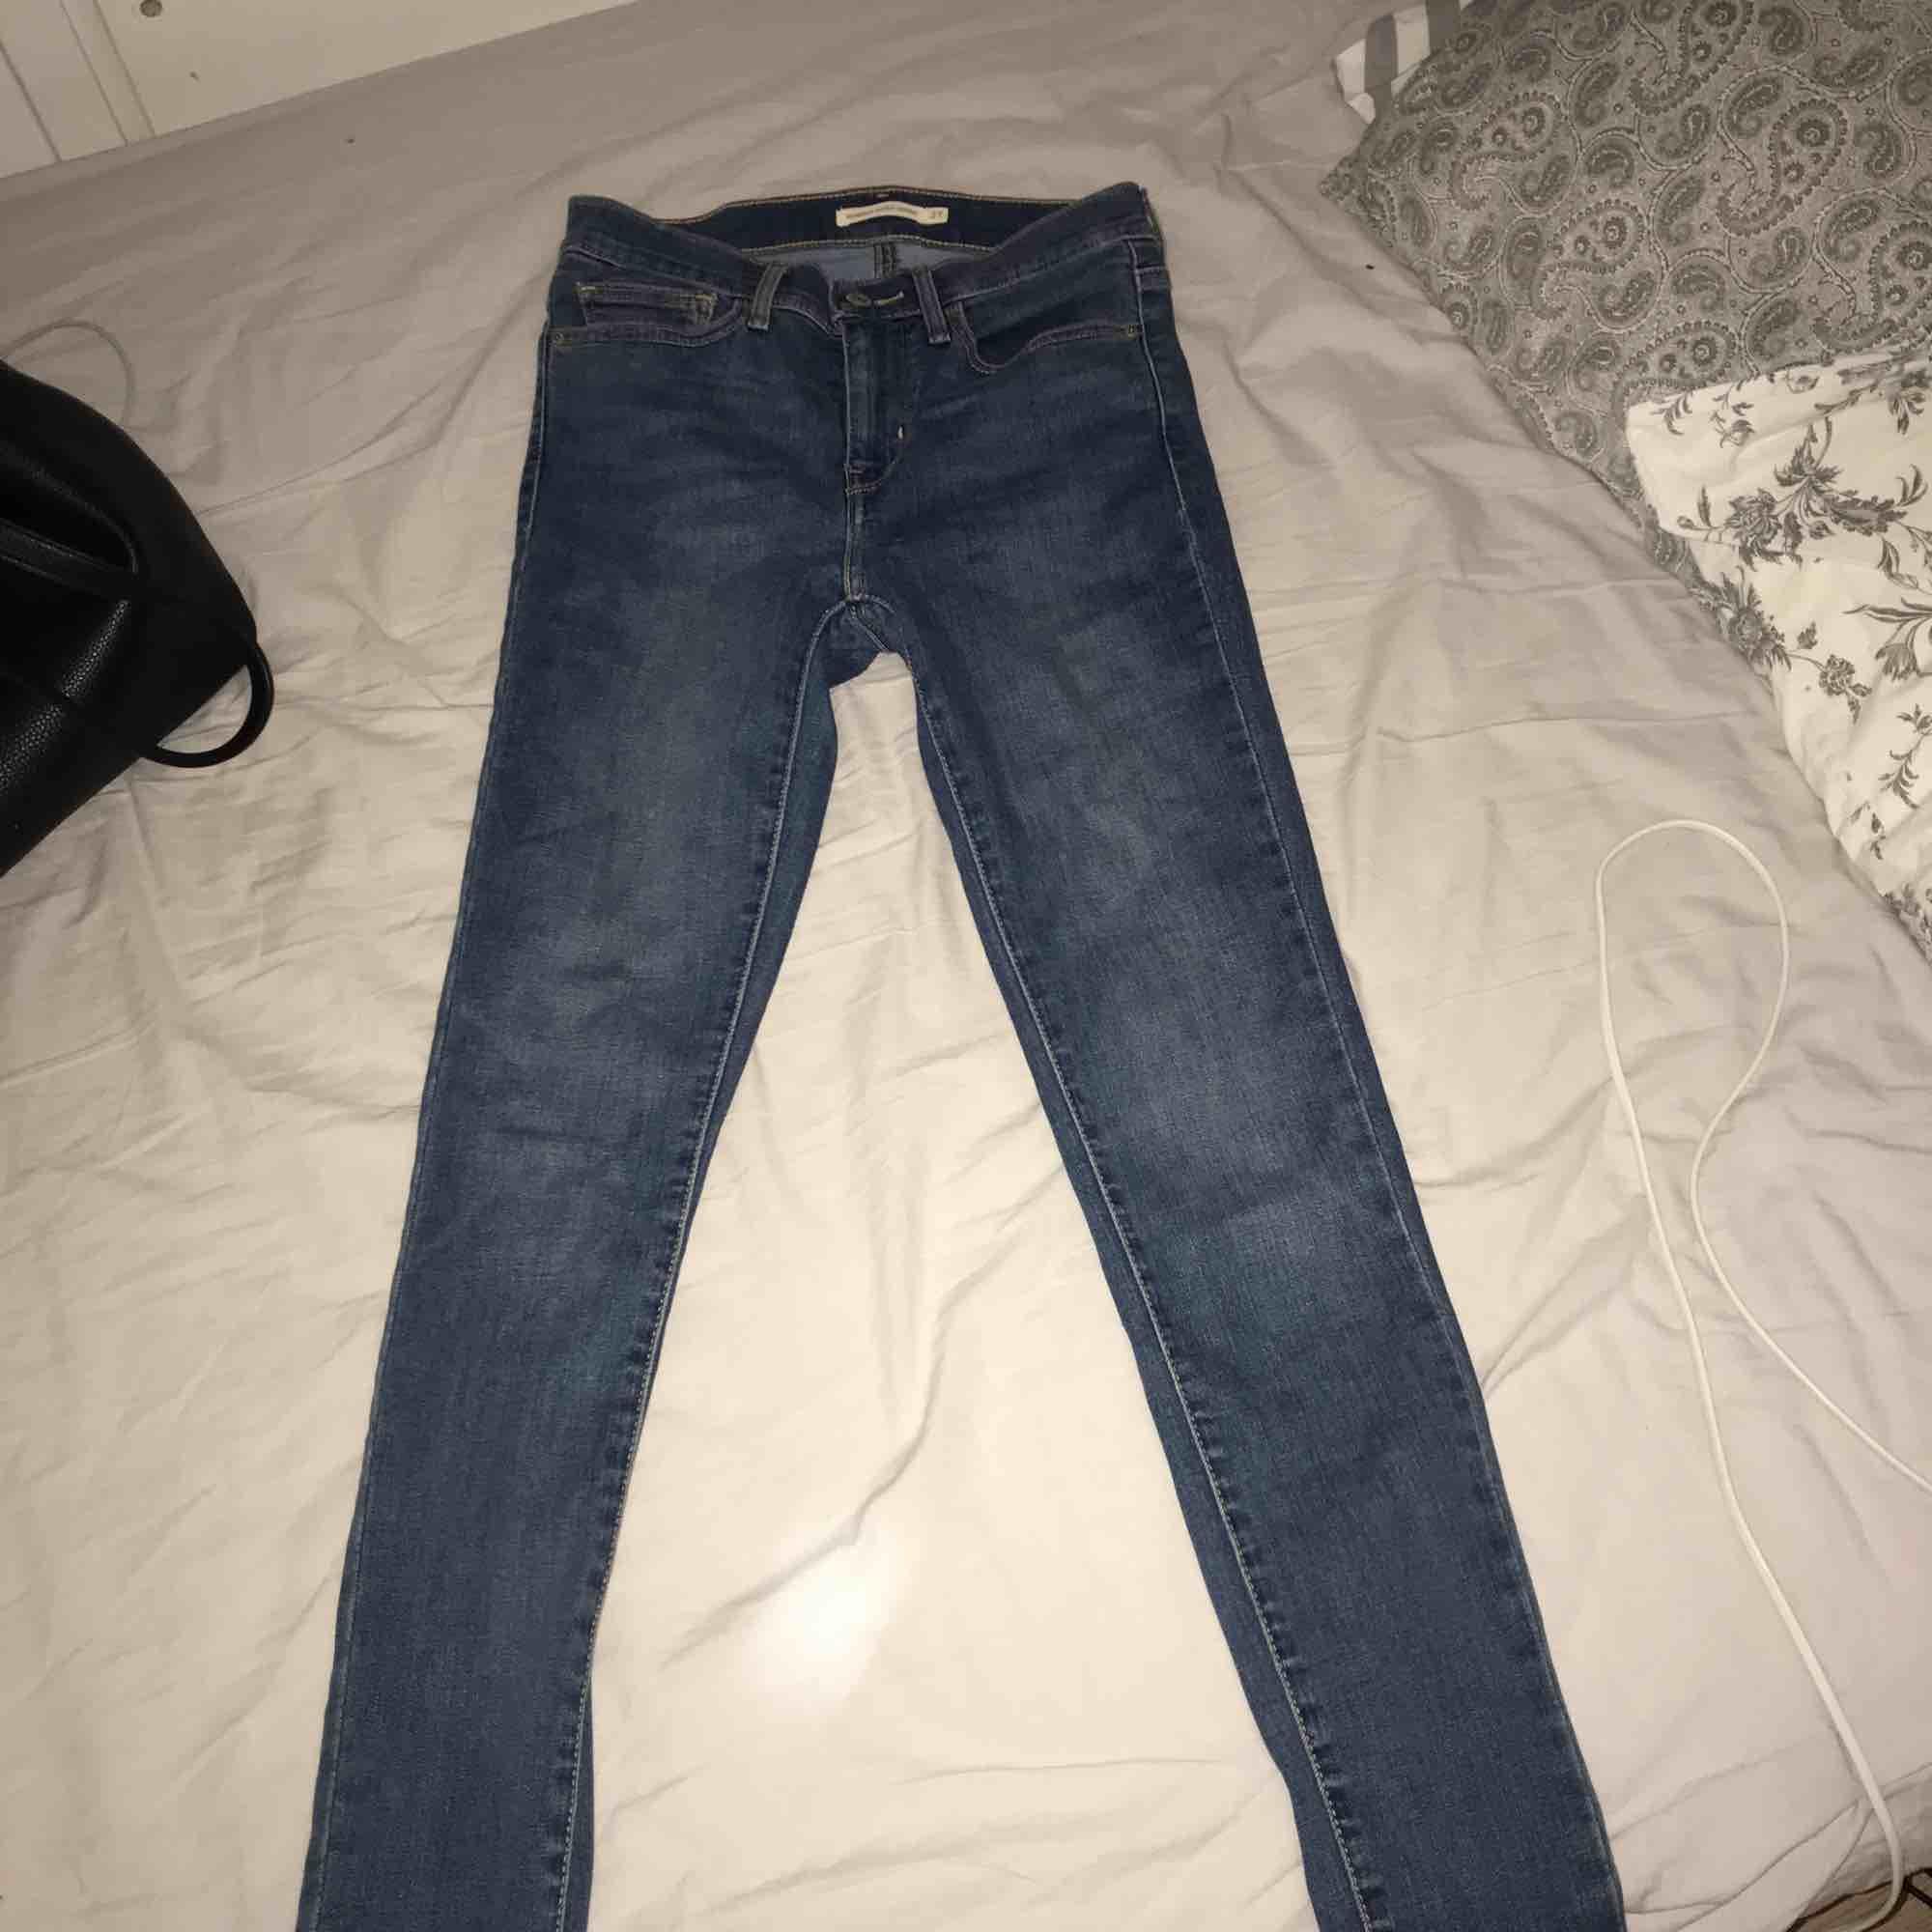 levis jeans storlekar